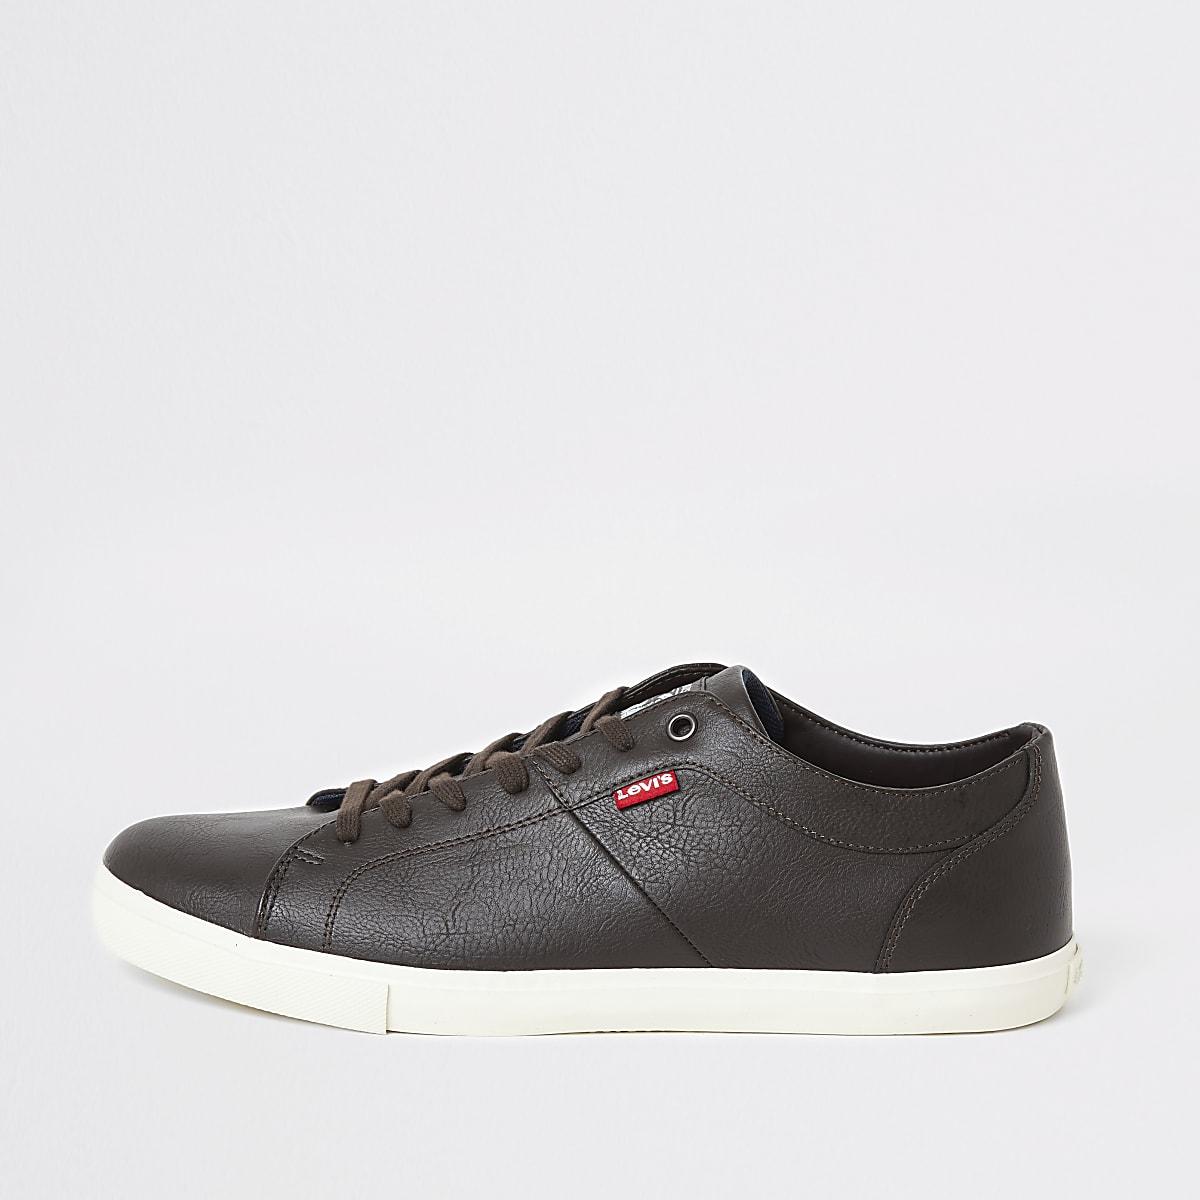 Levi's - Woods - Donkerbruine sneakers